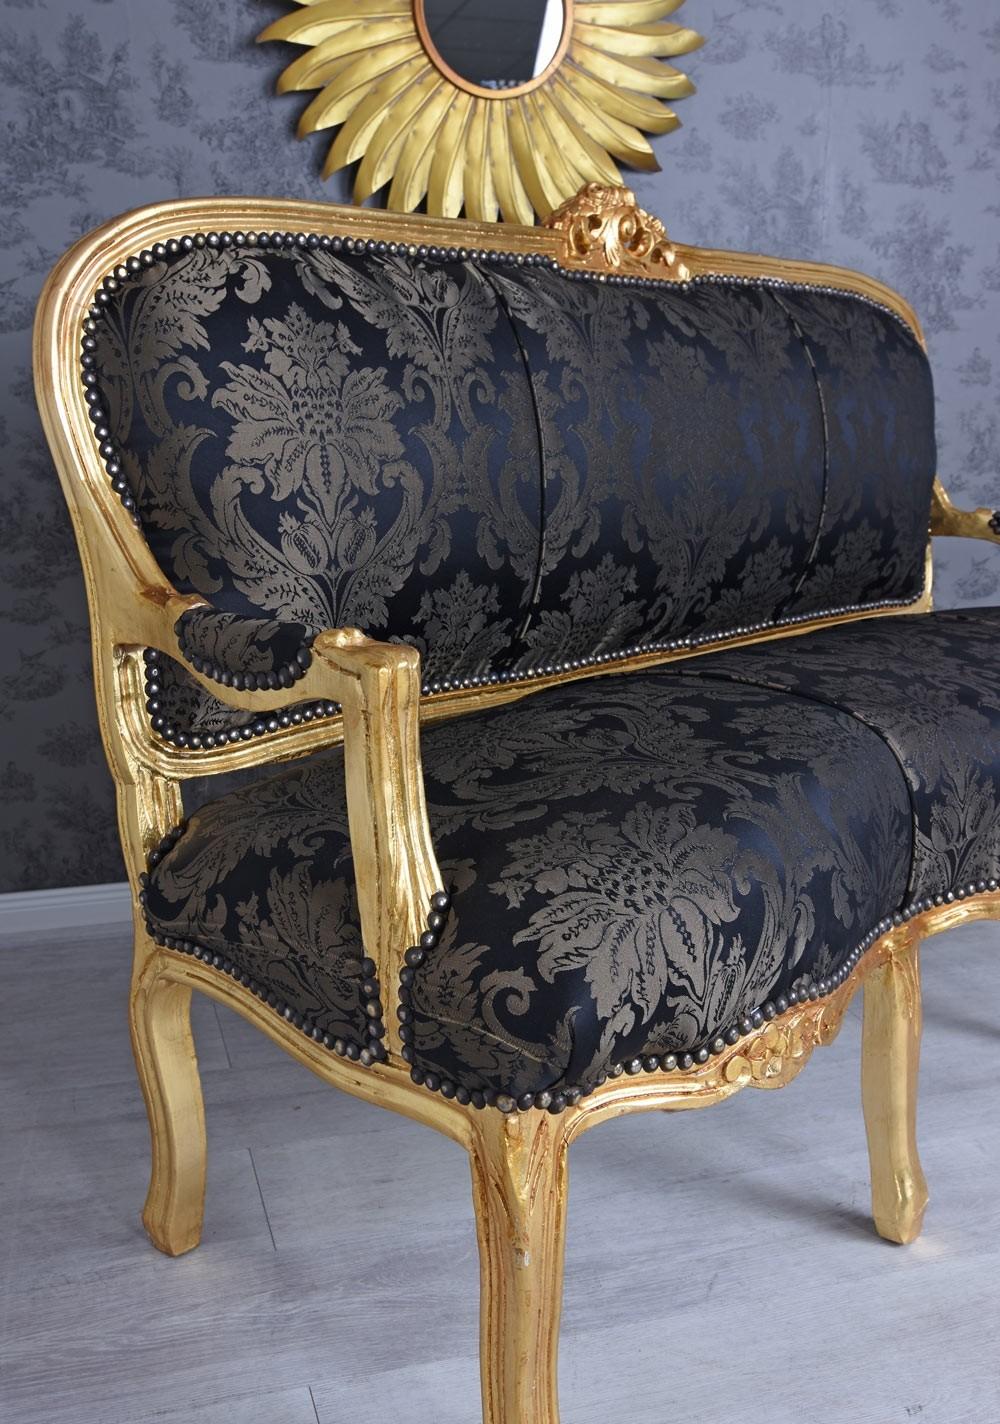 Full Size of Sofa Barock Barockstil Baroque Style Set Schwarz Gold Silber Stil Gebraucht Kaufen Grau Sofas Blau Palazzo24de Polyrattan Kleines überzug Tom Tailor Garten Sofa Sofa Barock